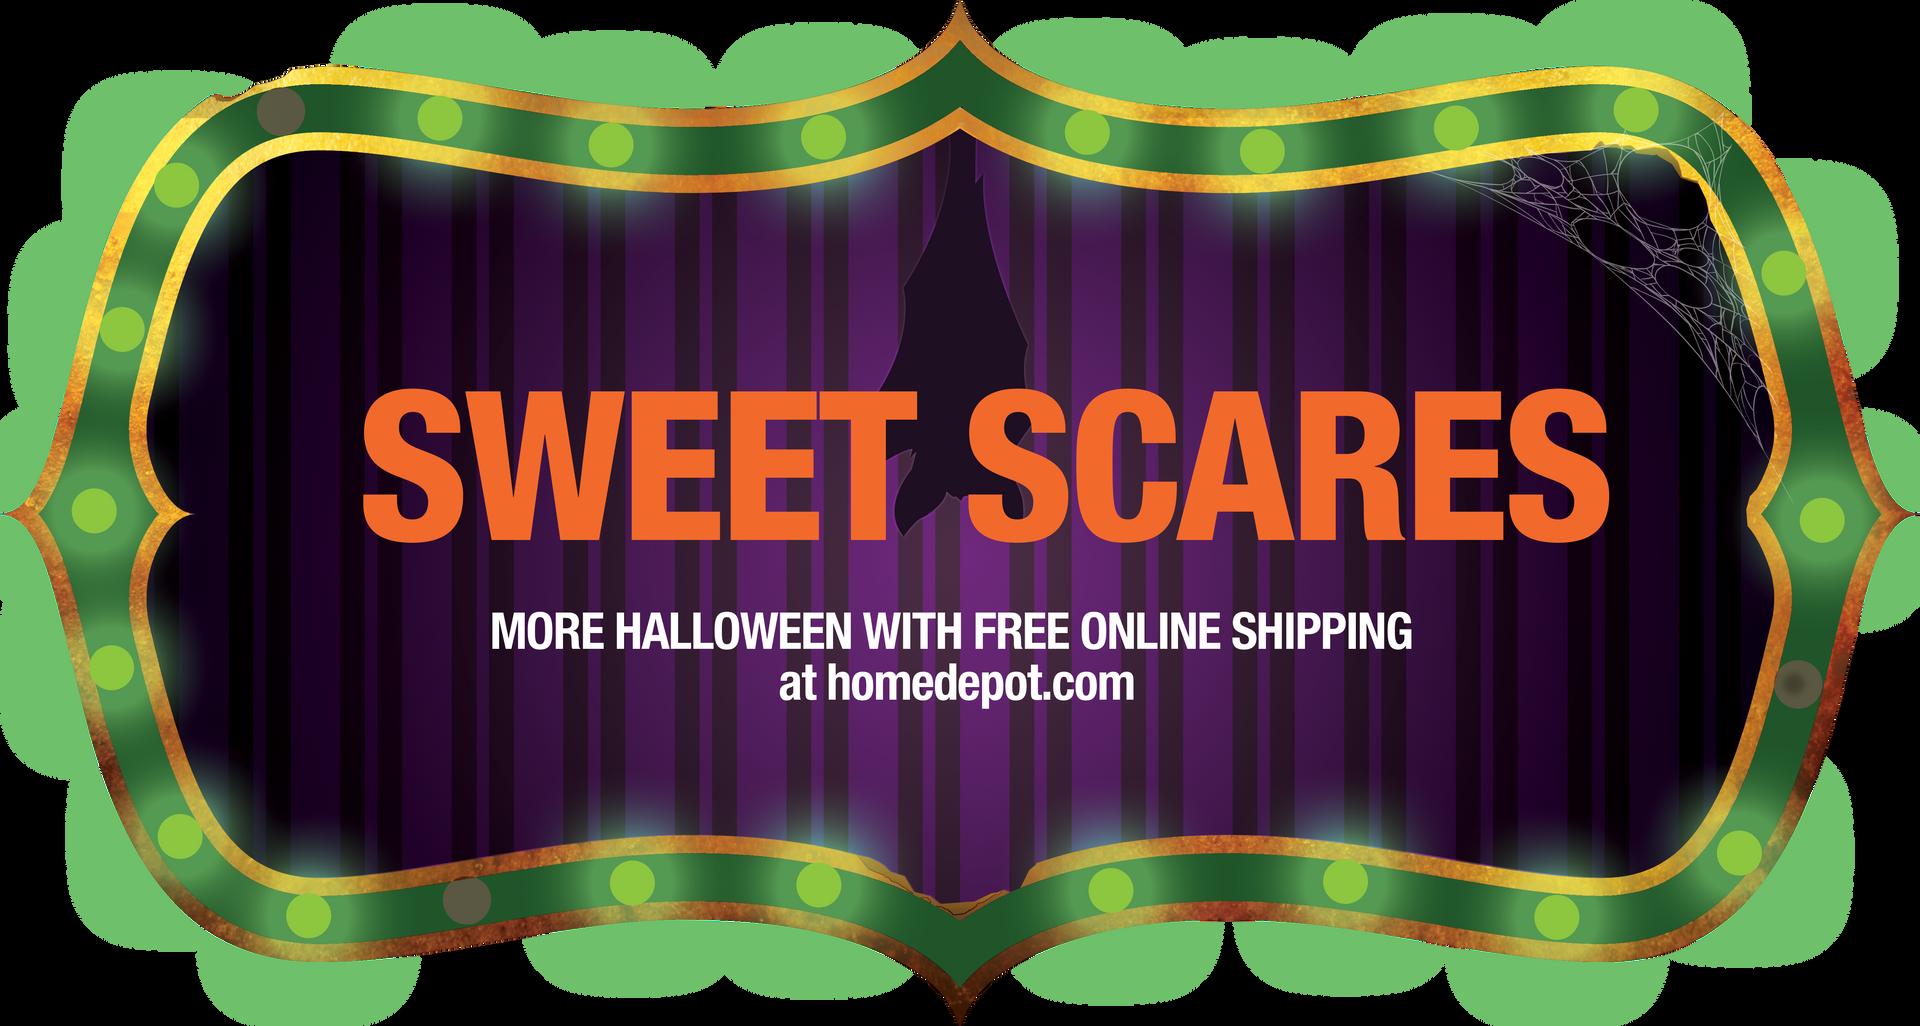 Sweet Scares Carnival Digital Art Signage Display Concept for Halloween